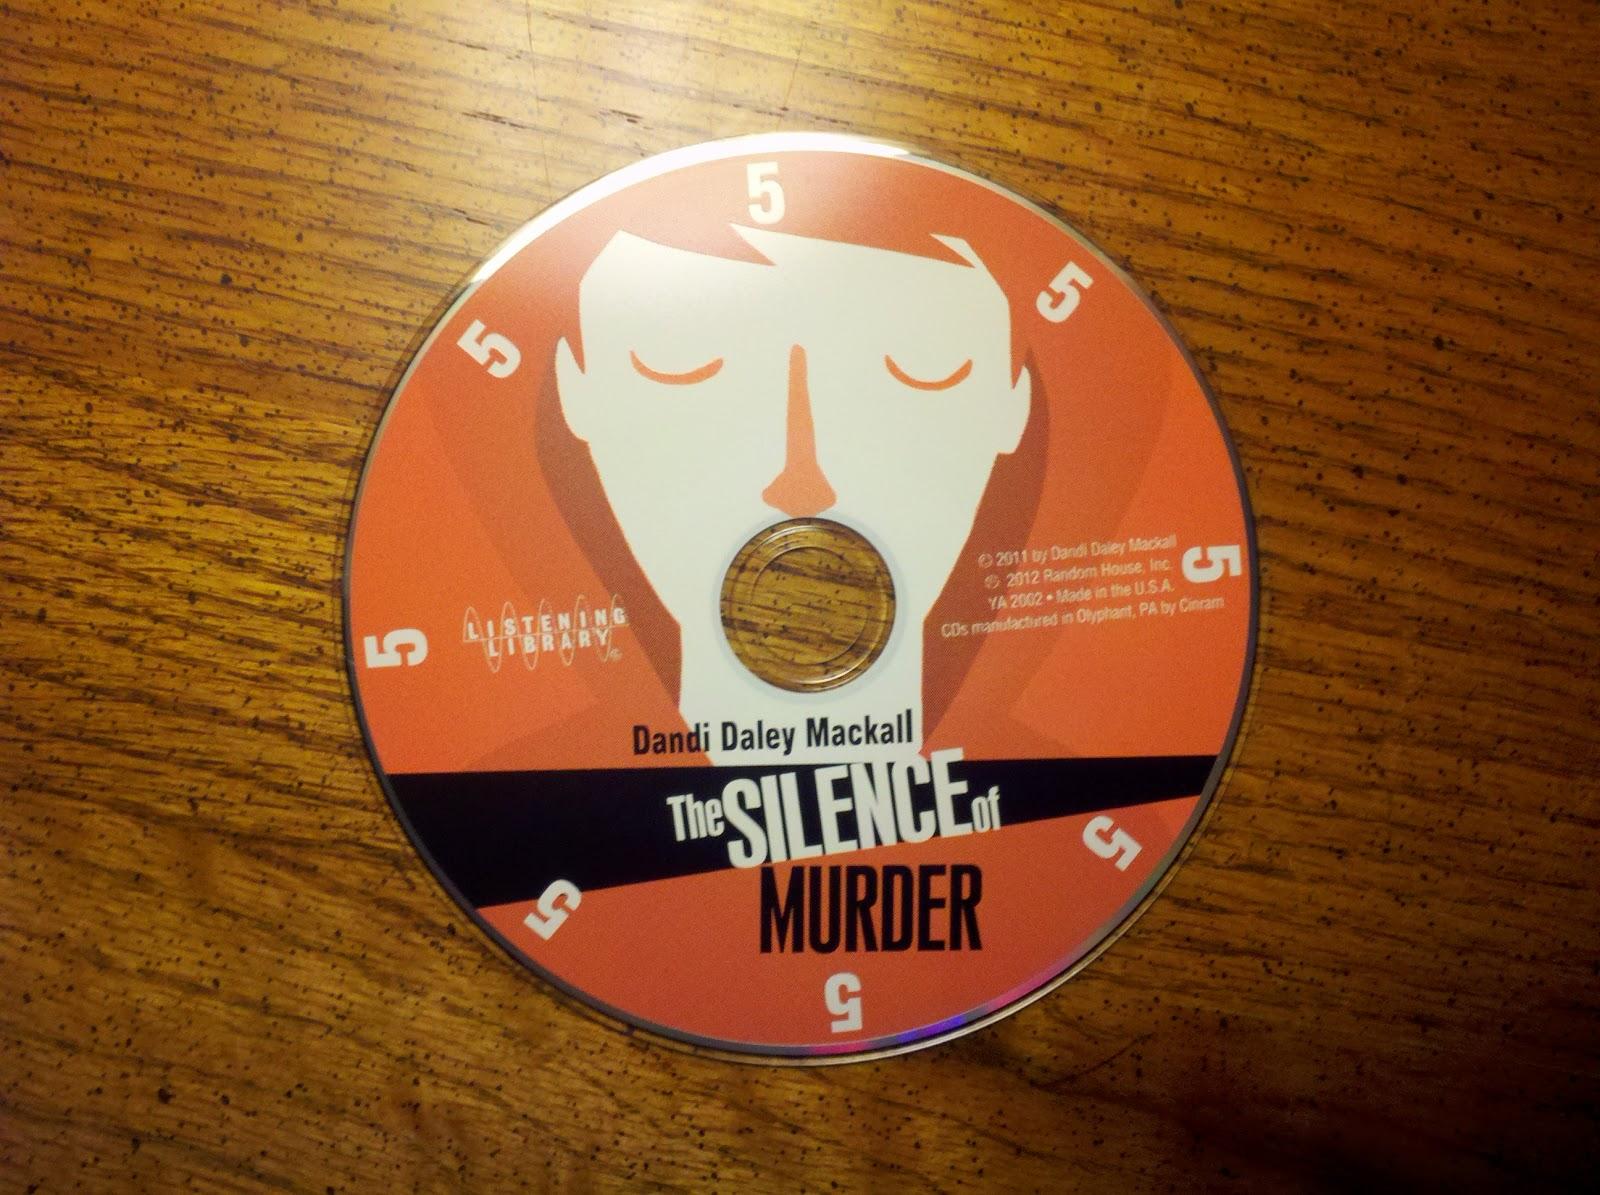 the silence of murder mackall d andi daley